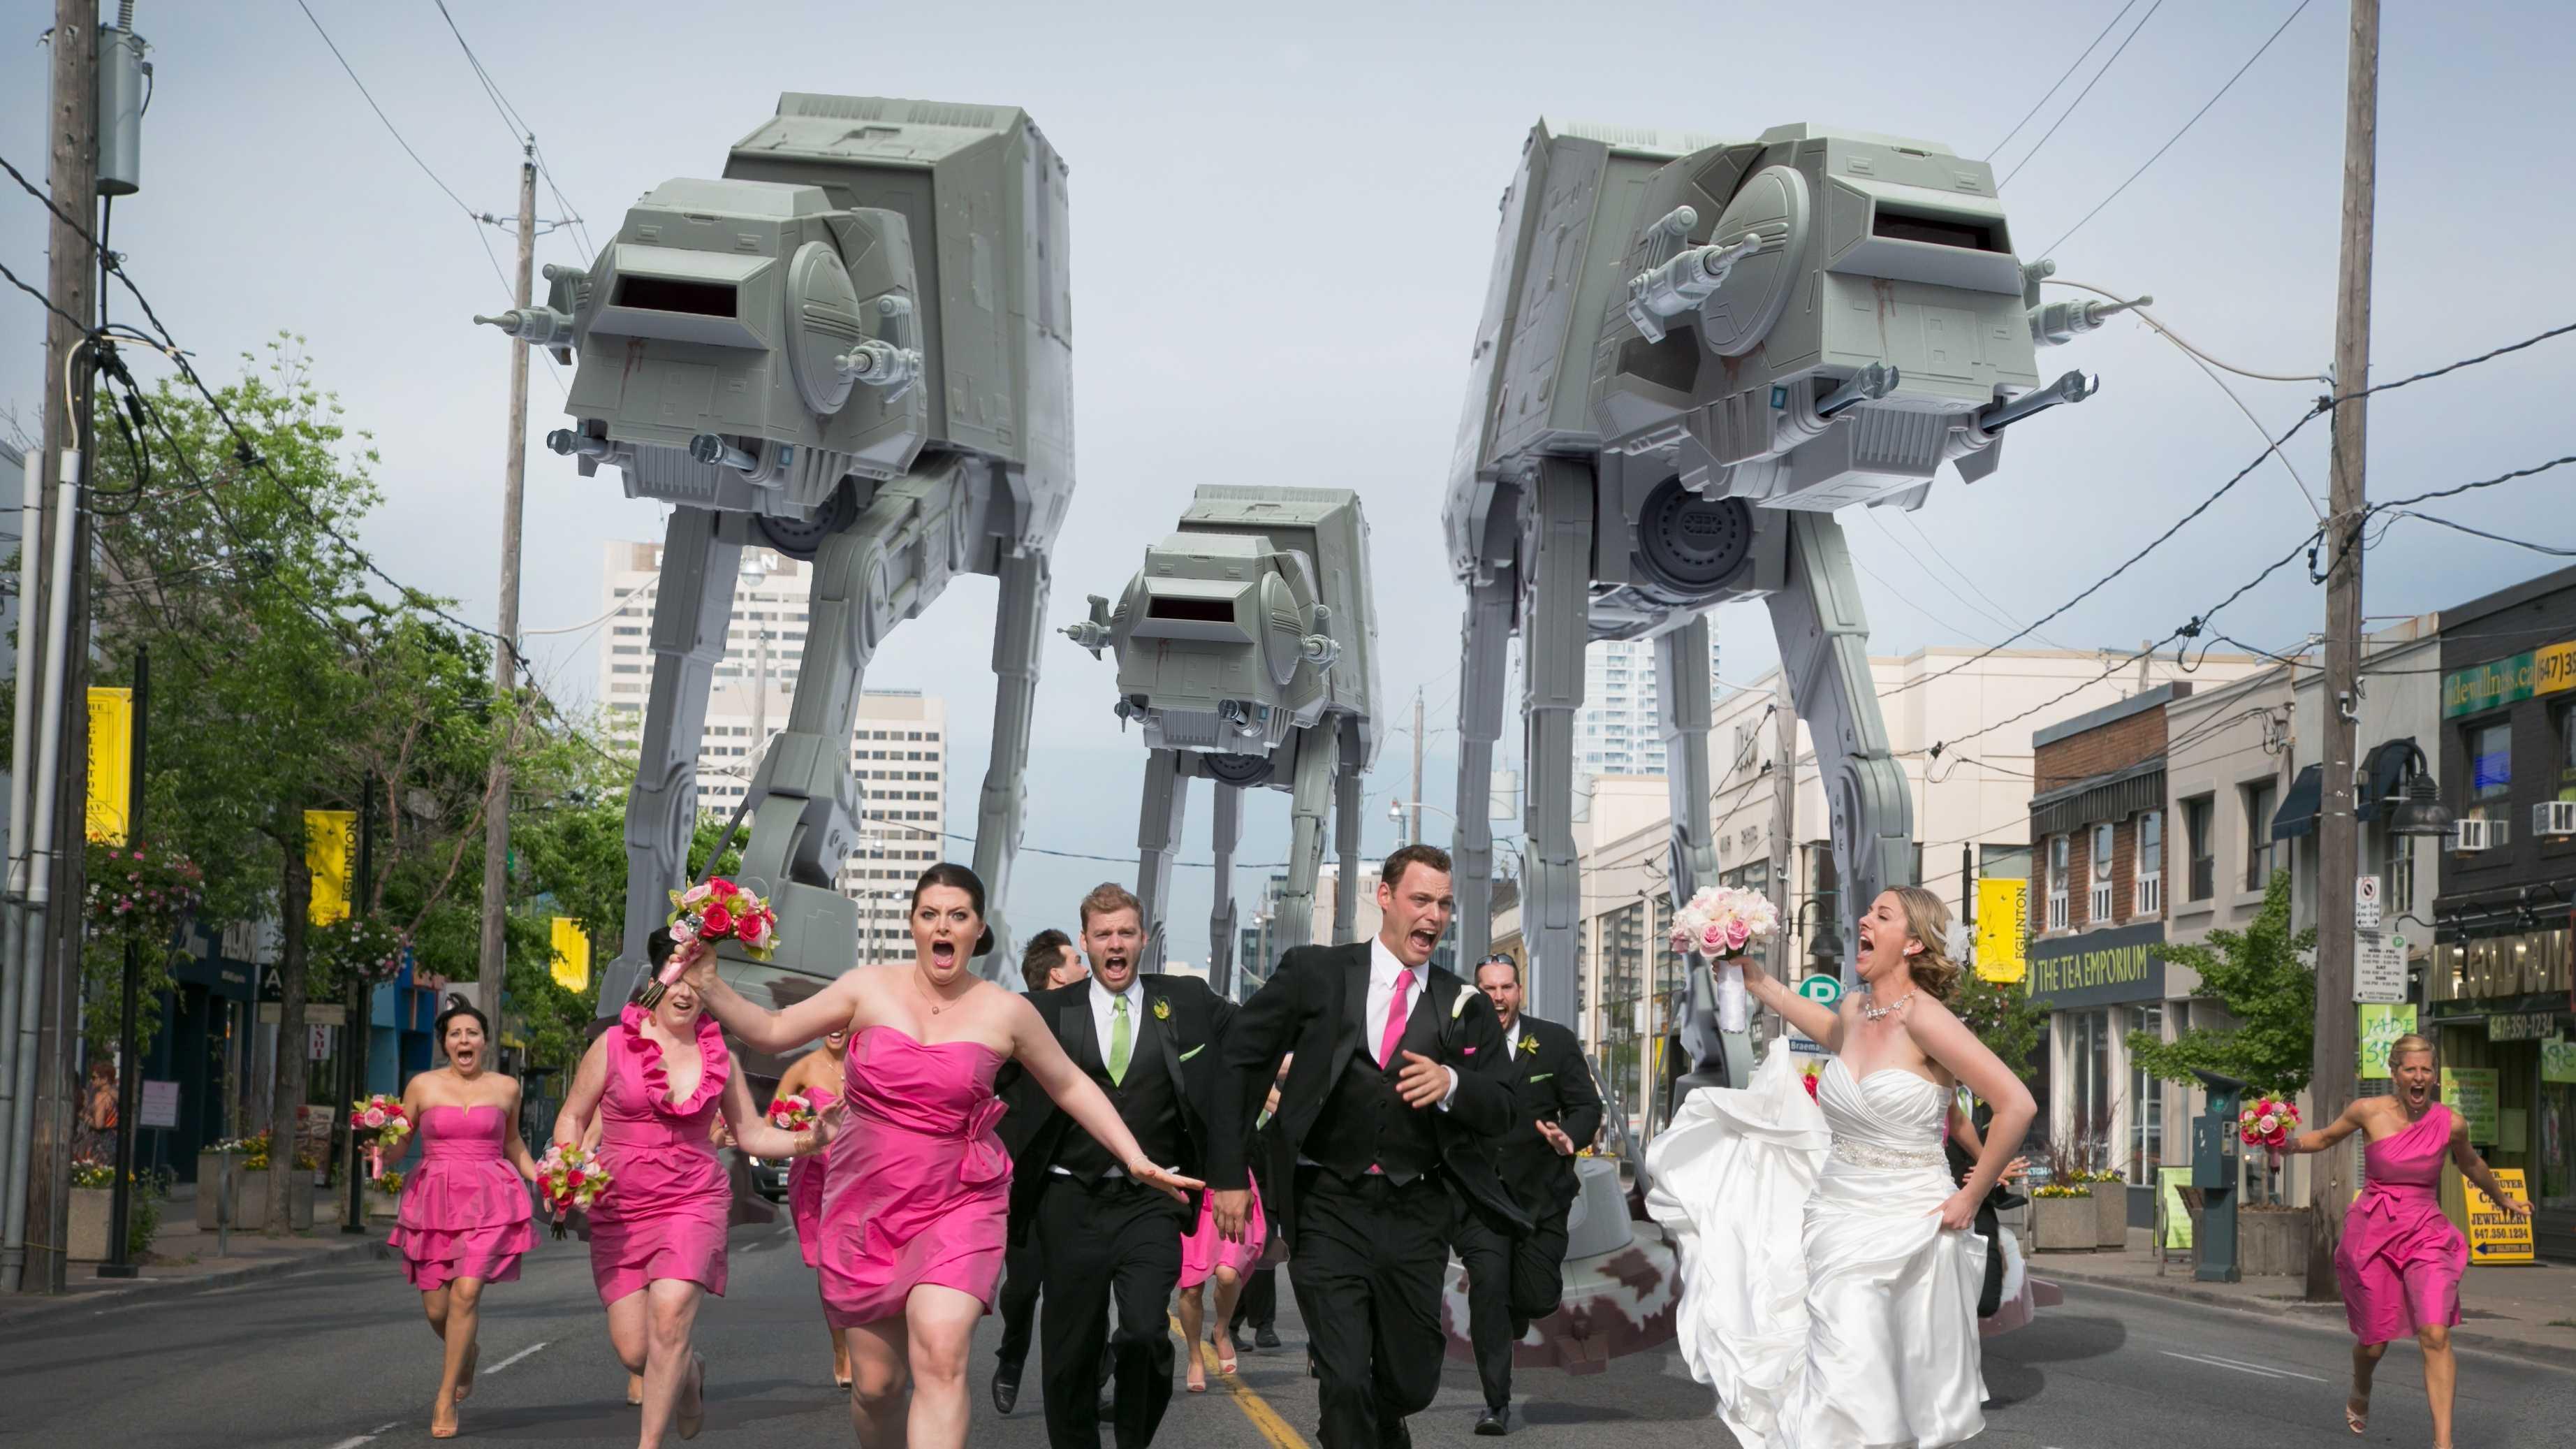 Star Wars Wedding Theme Photos